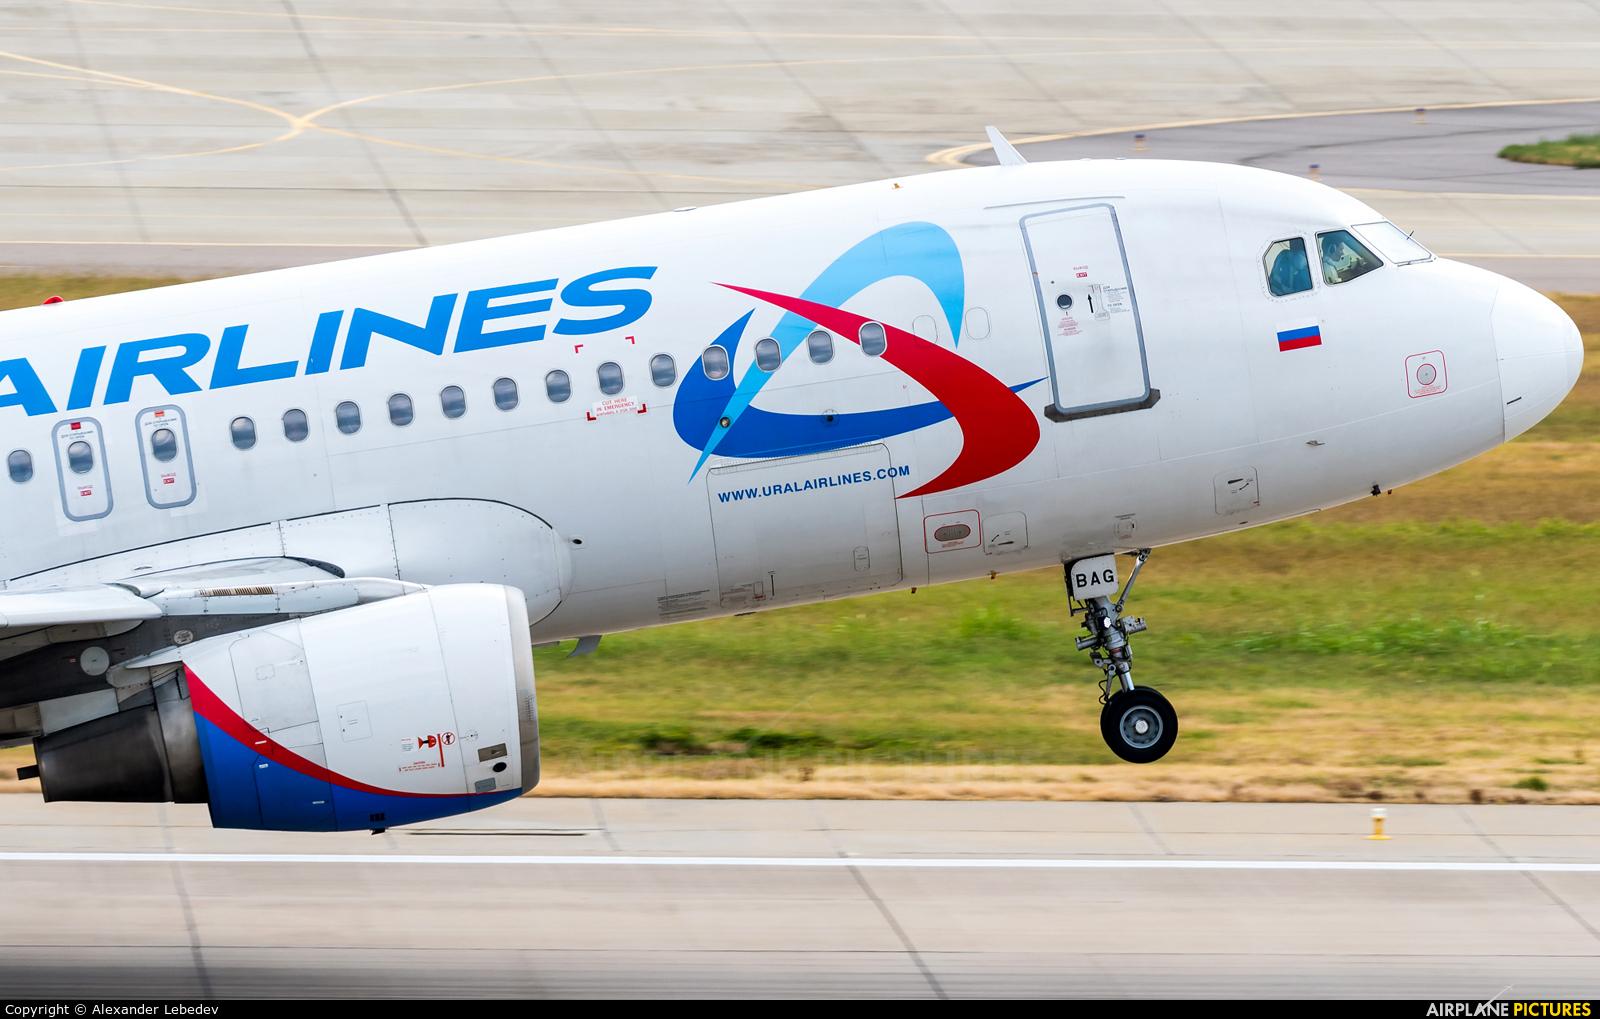 Ural Airlines VQ-BAG aircraft at Sochi Intl